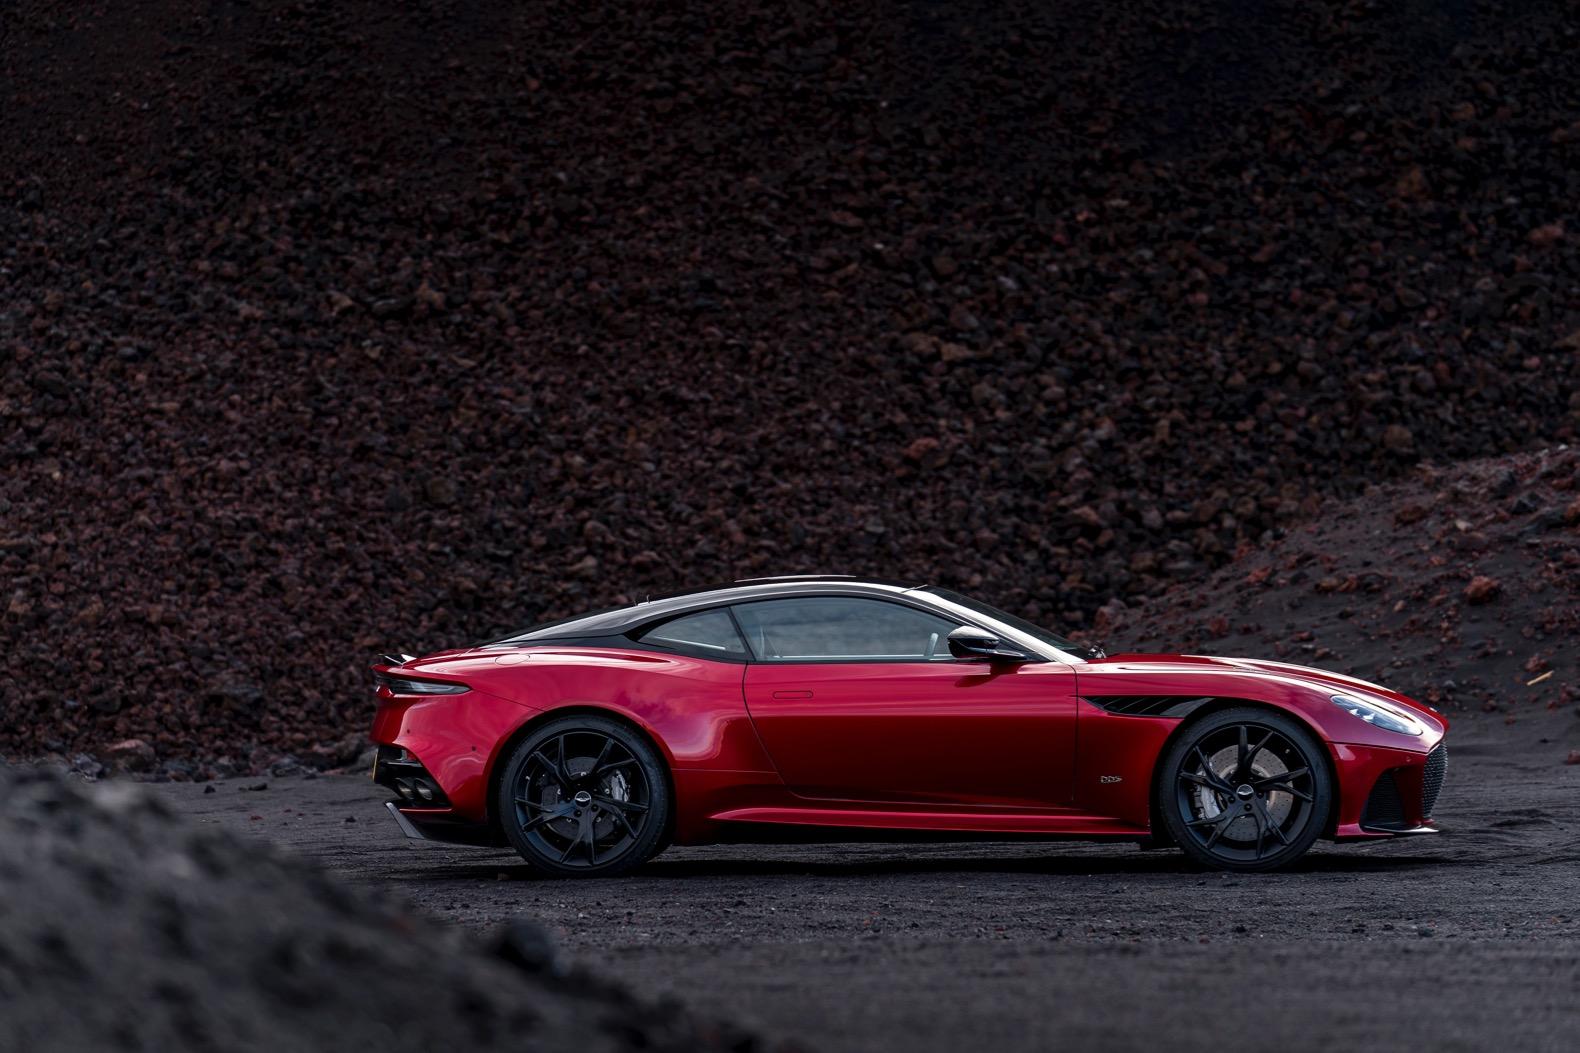 2019-Aston-Martin-DBS-Superleggera-00011.jpg